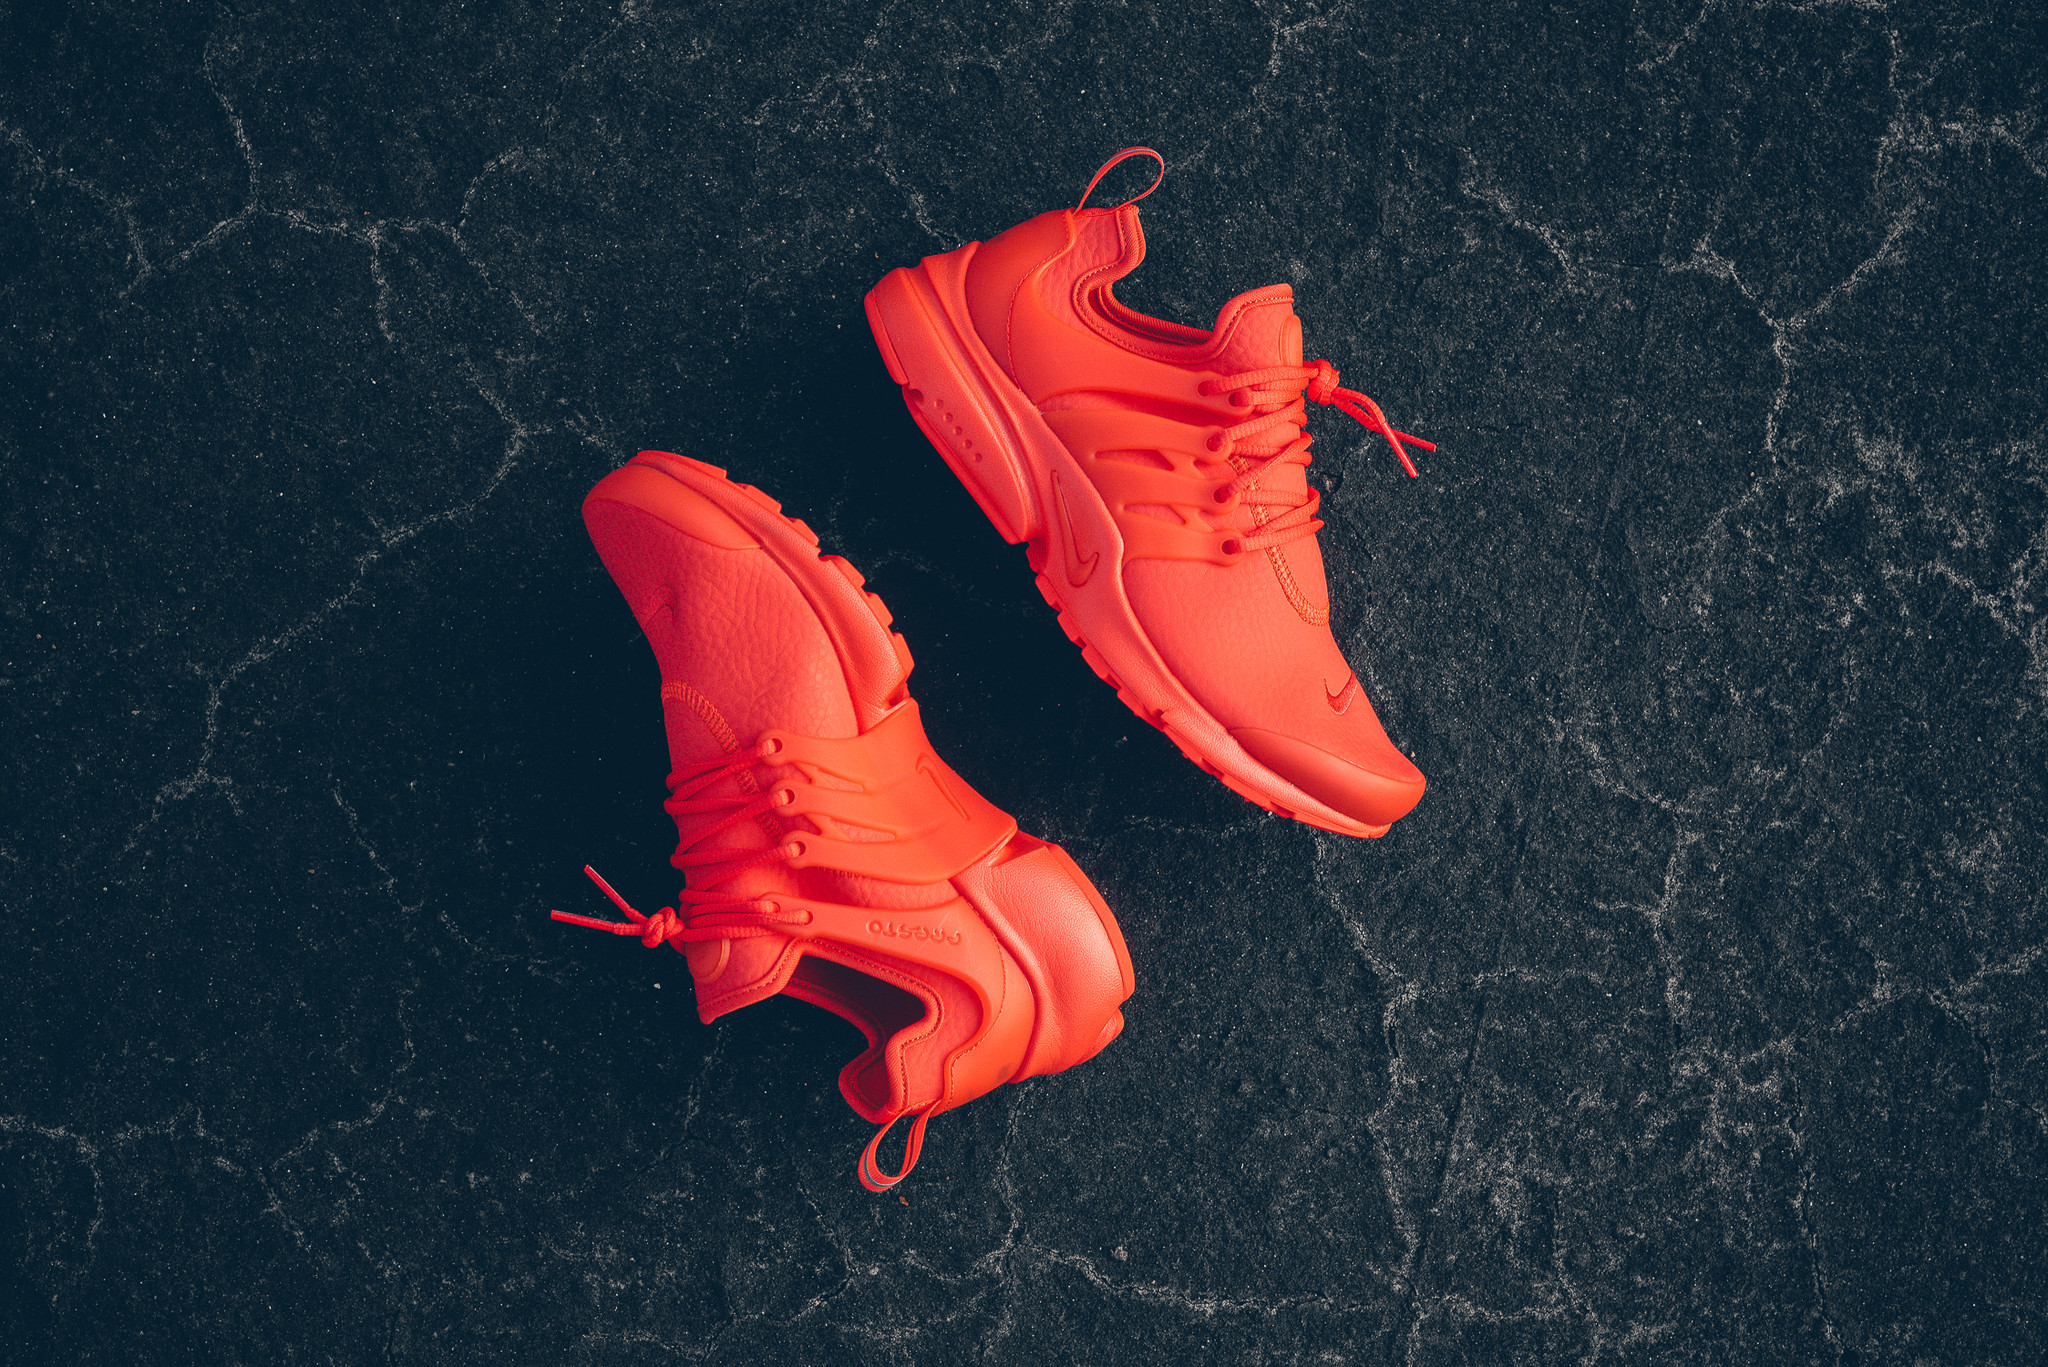 WMNS_Nike_Air_Presto_PRM_Max_Orange_Sneaker_Politics_HypeBeast_6